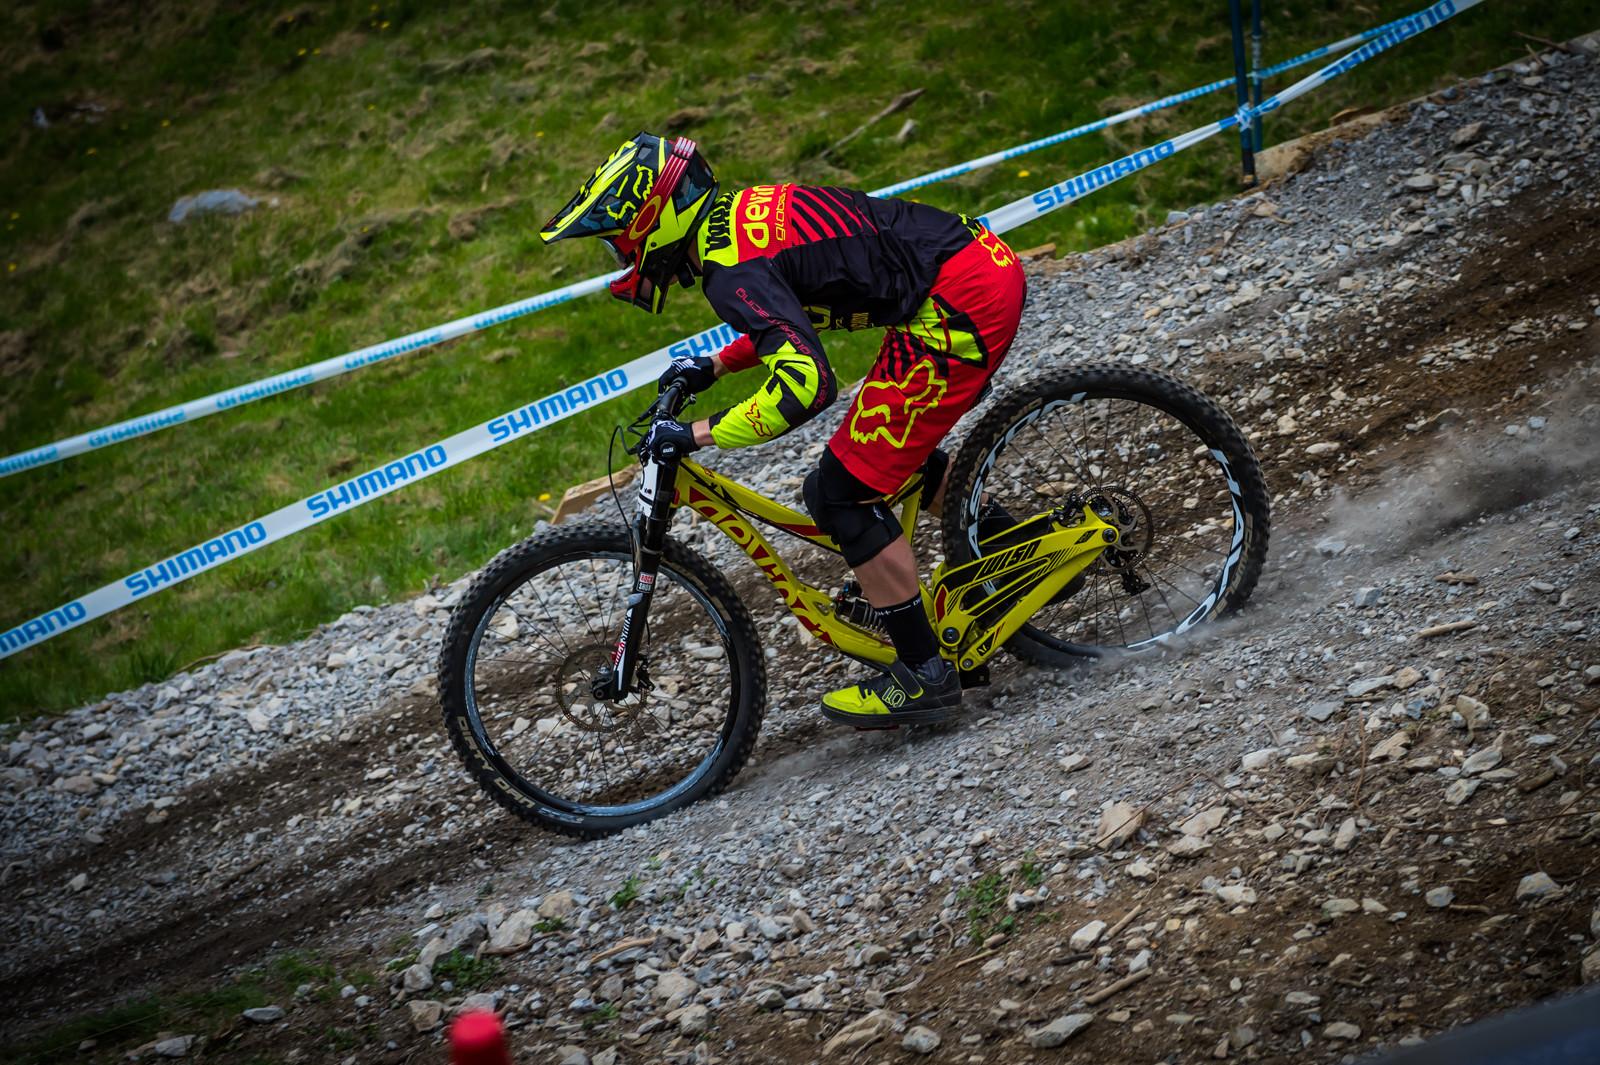 Devinci G-Out Project - Lourdes World Cup - G-Out Project - Lourdes World Cup - Mountain Biking Pictures - Vital MTB